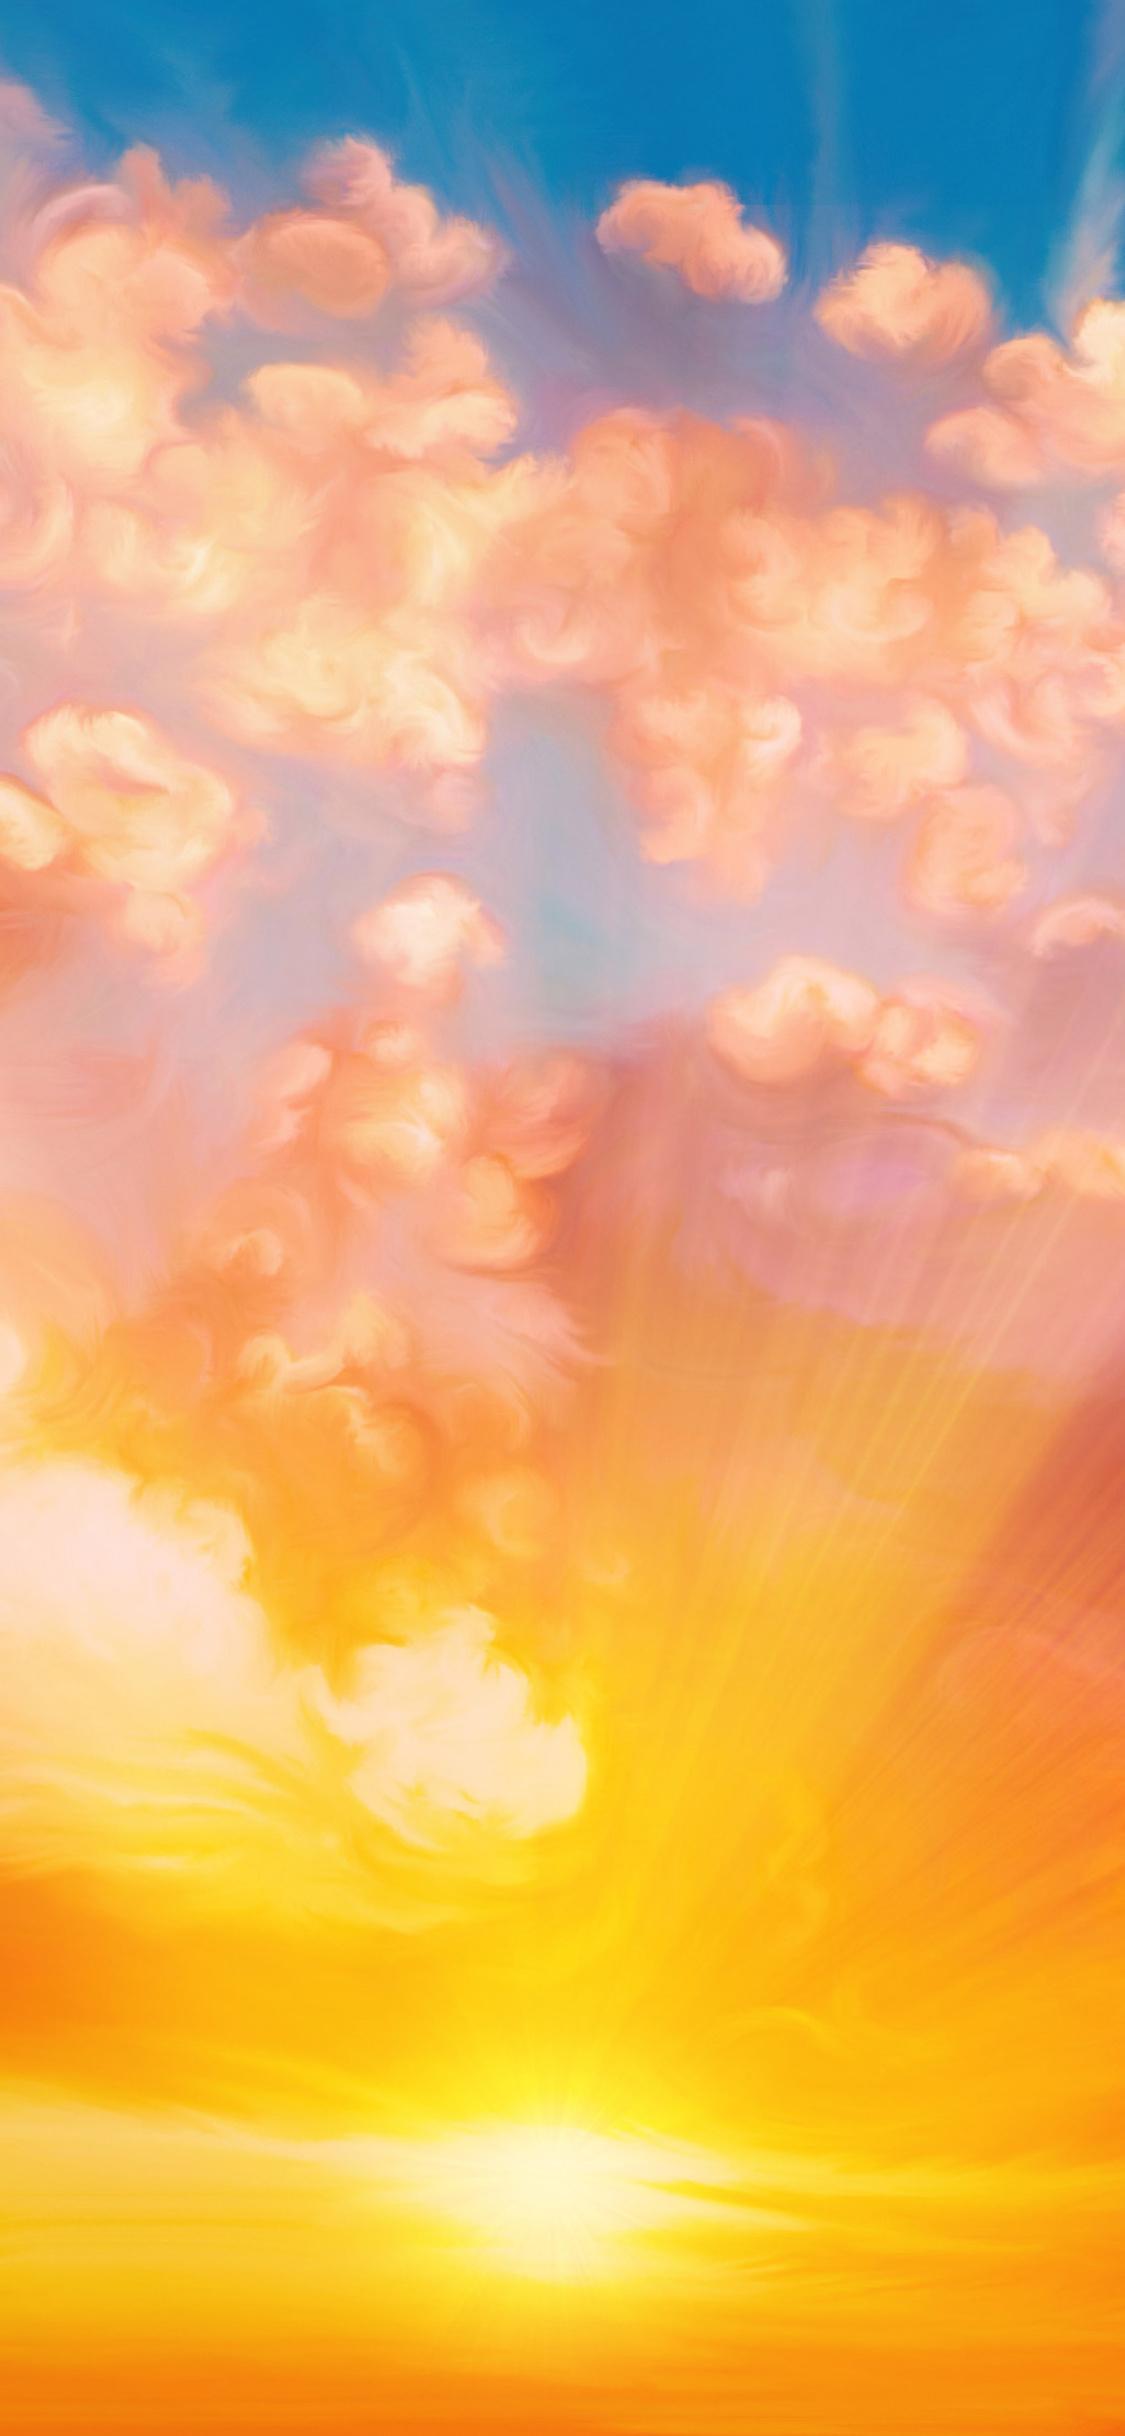 1125x2436 Sunset Sky Painting Iphone Xs Iphone 10 Iphone X